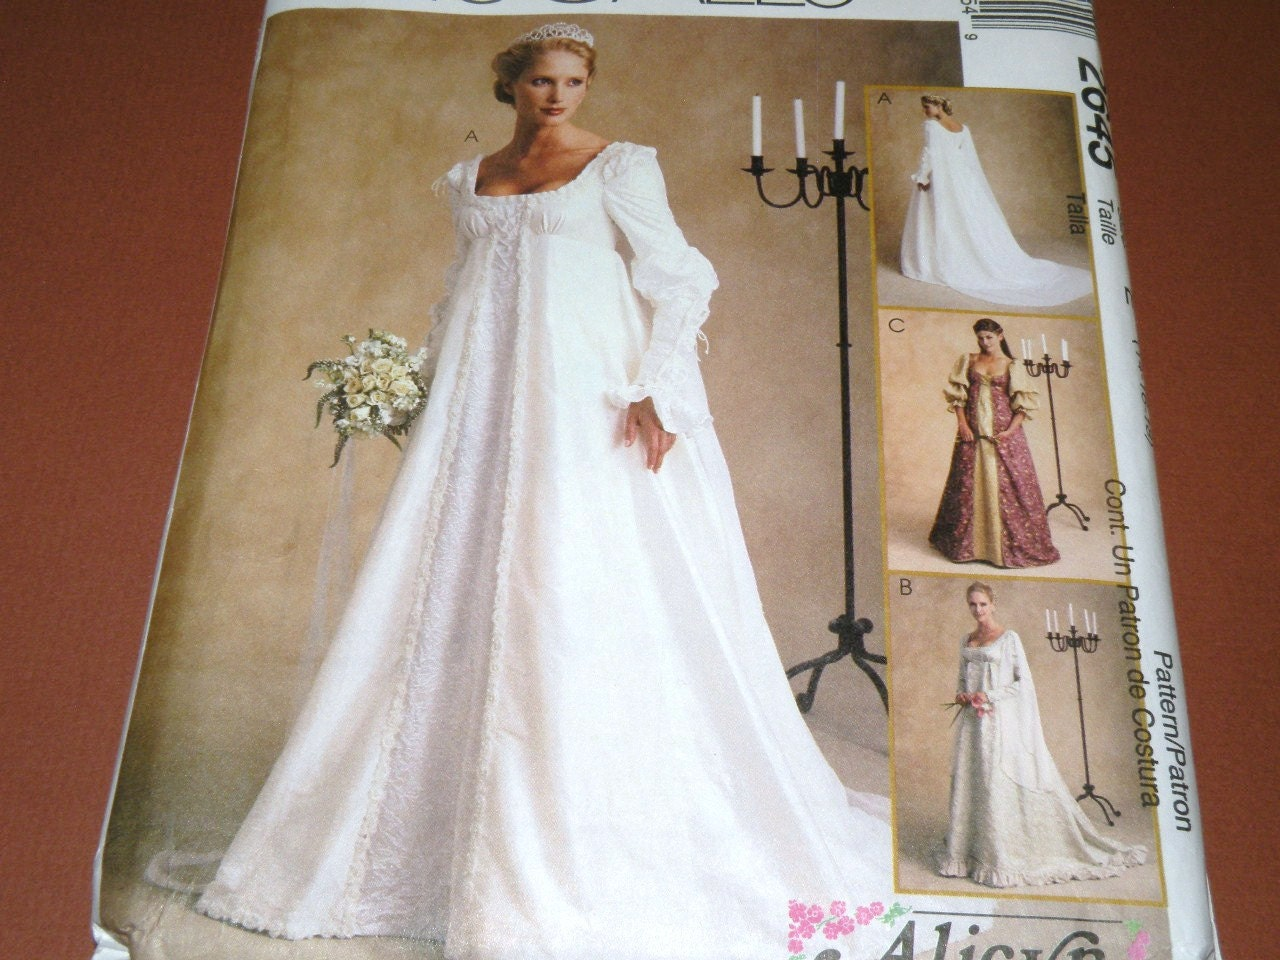 Mccalls 2645 sizes 141618 bridal gown pattern uncut for Wedding dress patterns mccalls